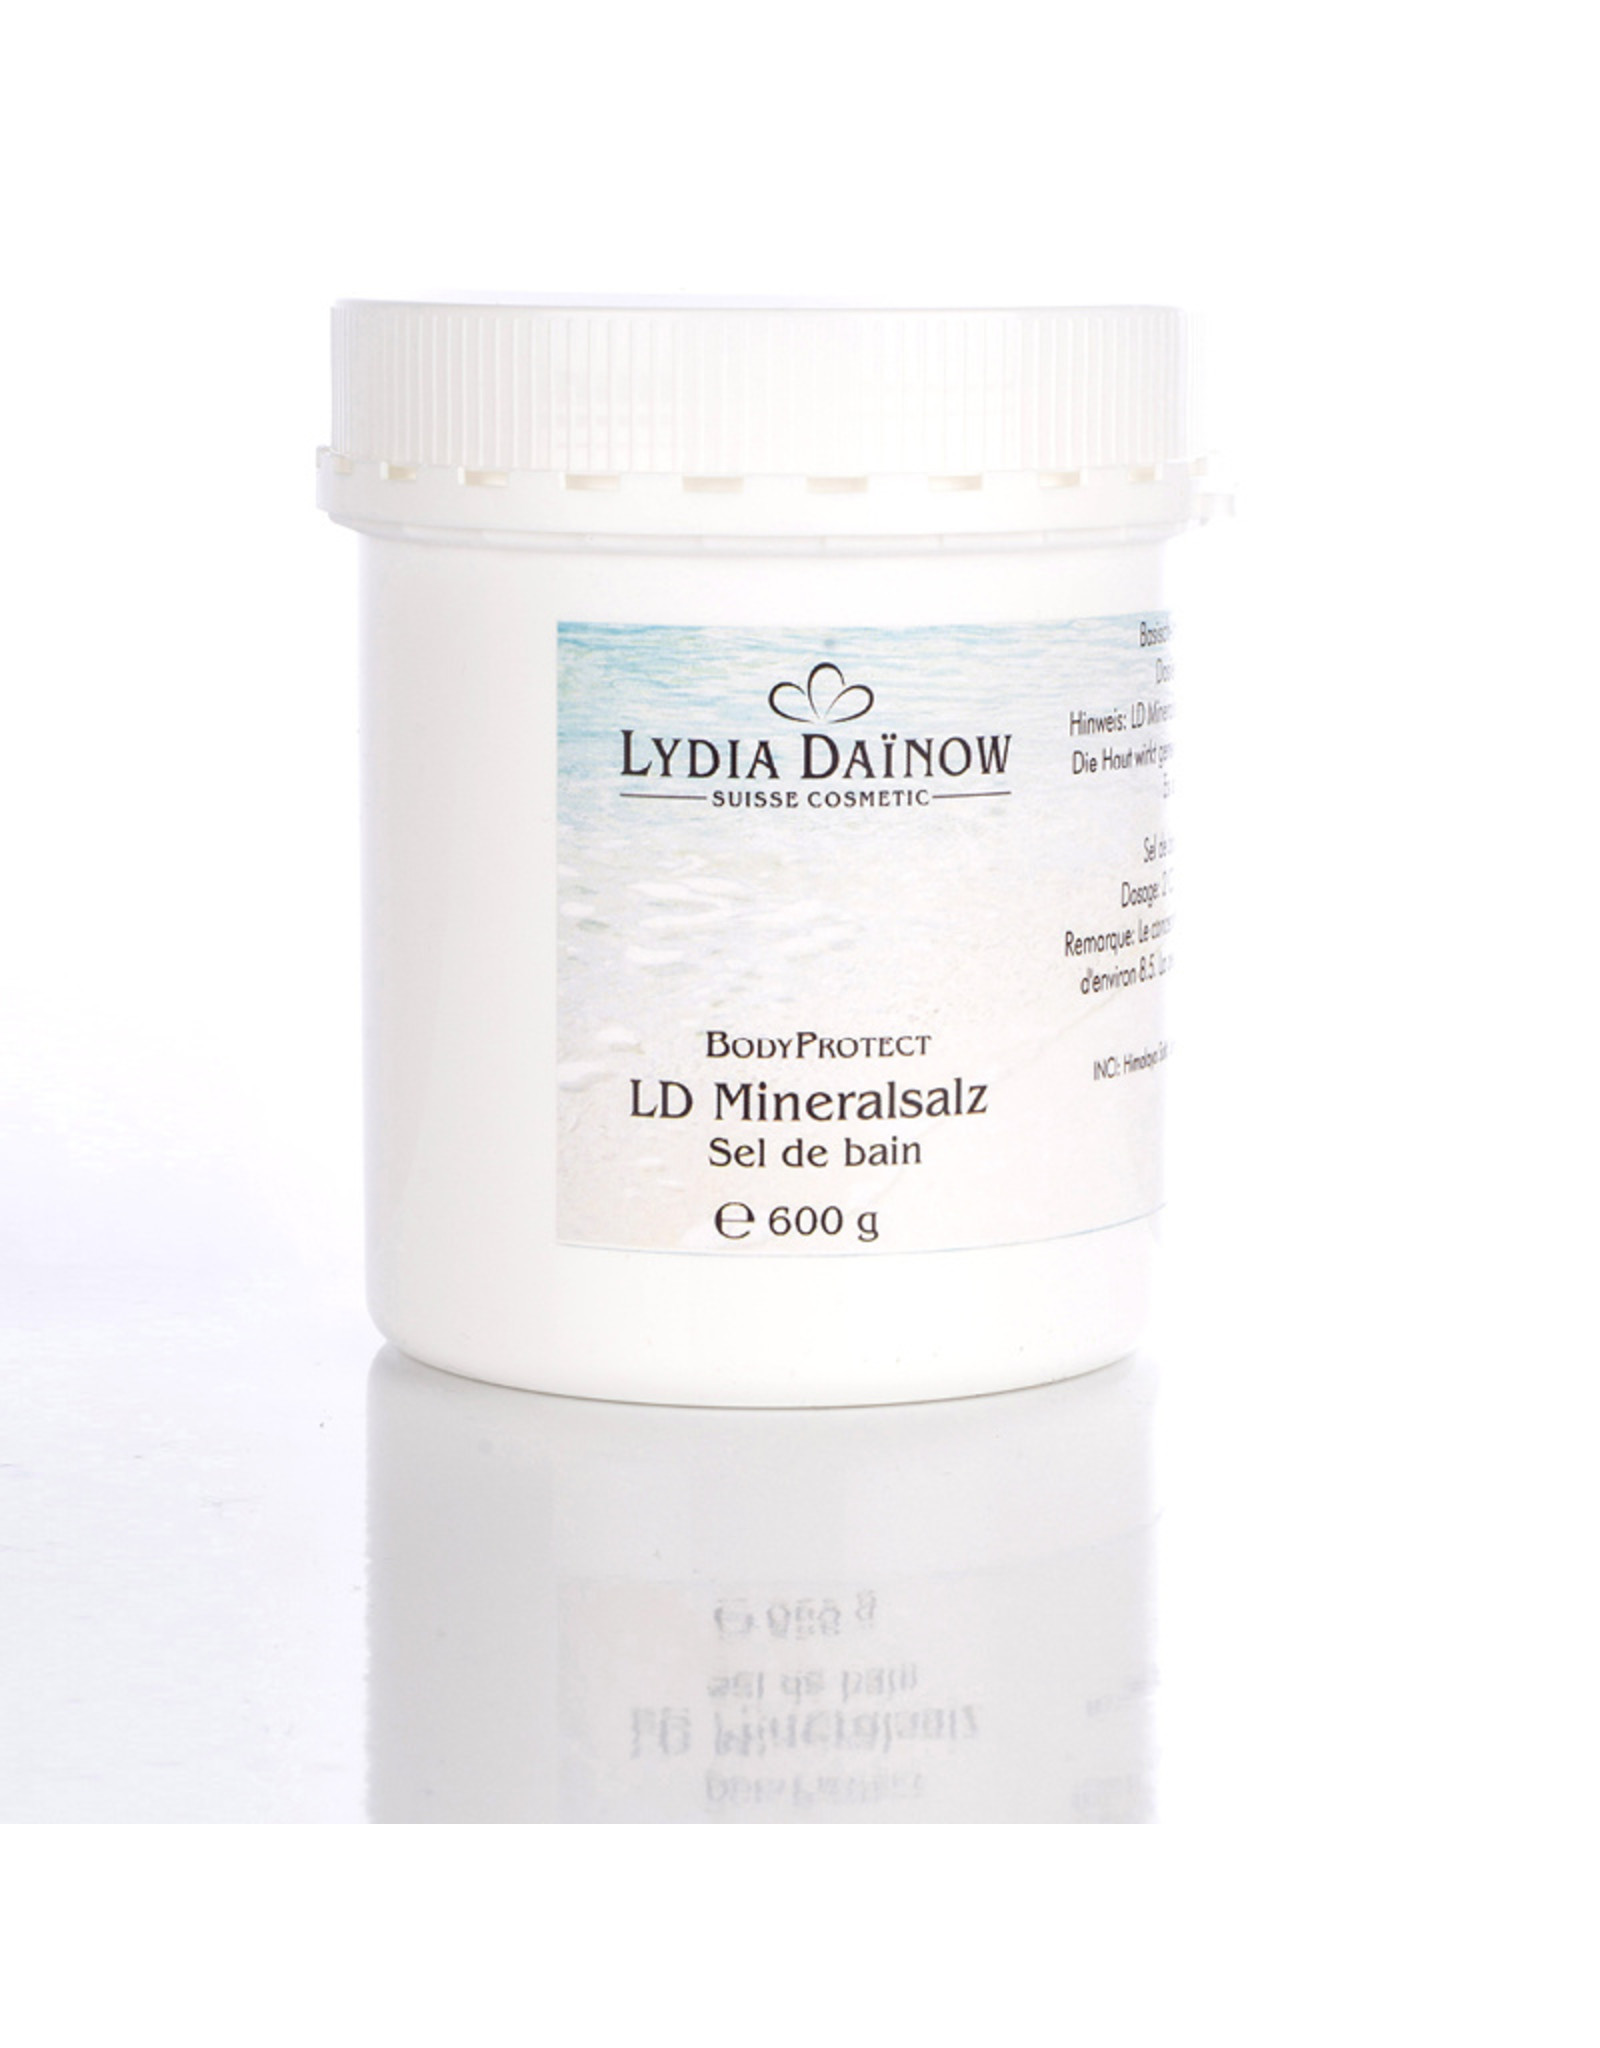 Lydïa Dainow LD  Mineralsalz - Sel de bain basique